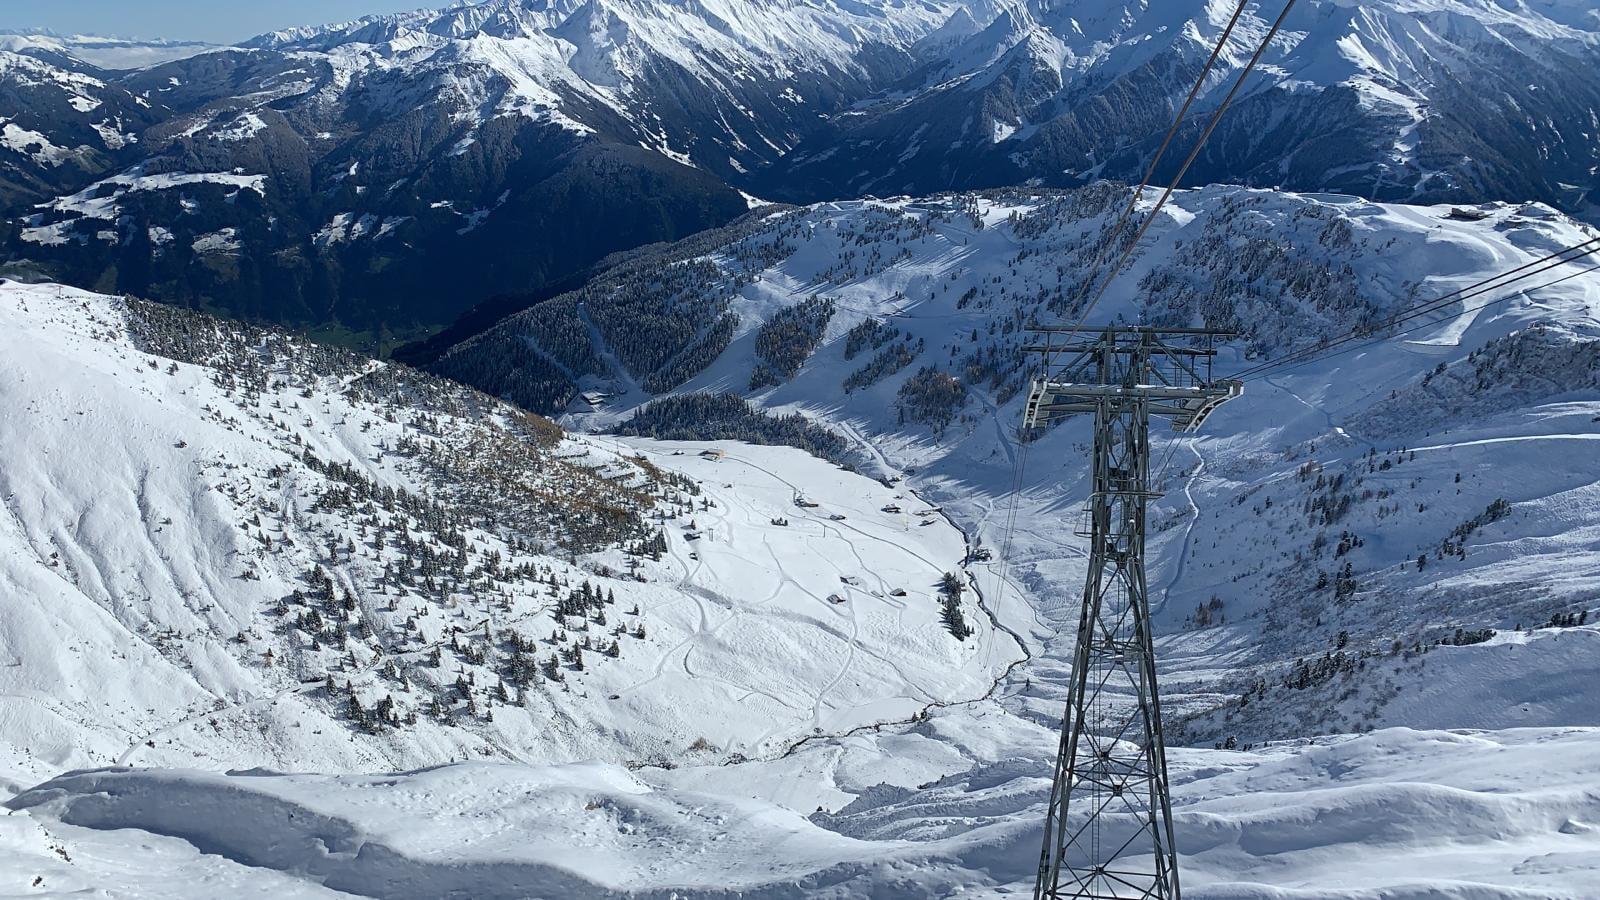 RISE&FALL: TVB Mayrhofen